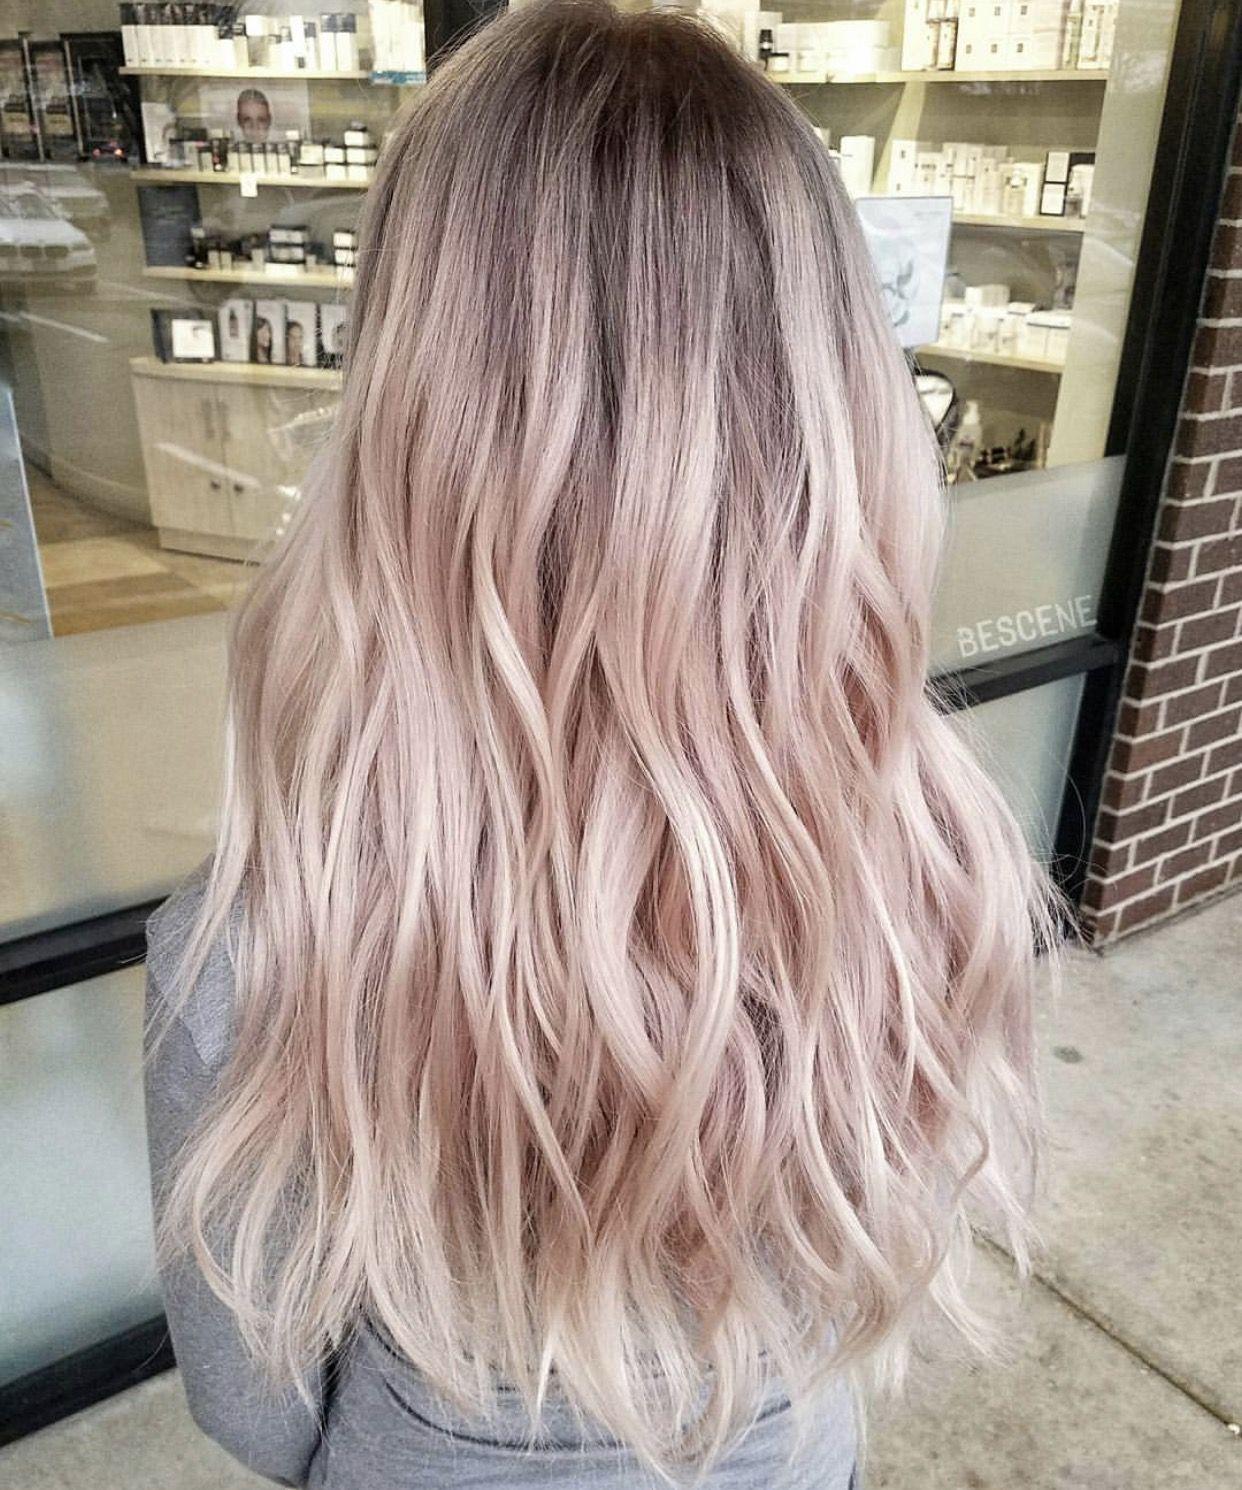 Image Result For Rose Gold Hair Old Lady Blondes Have